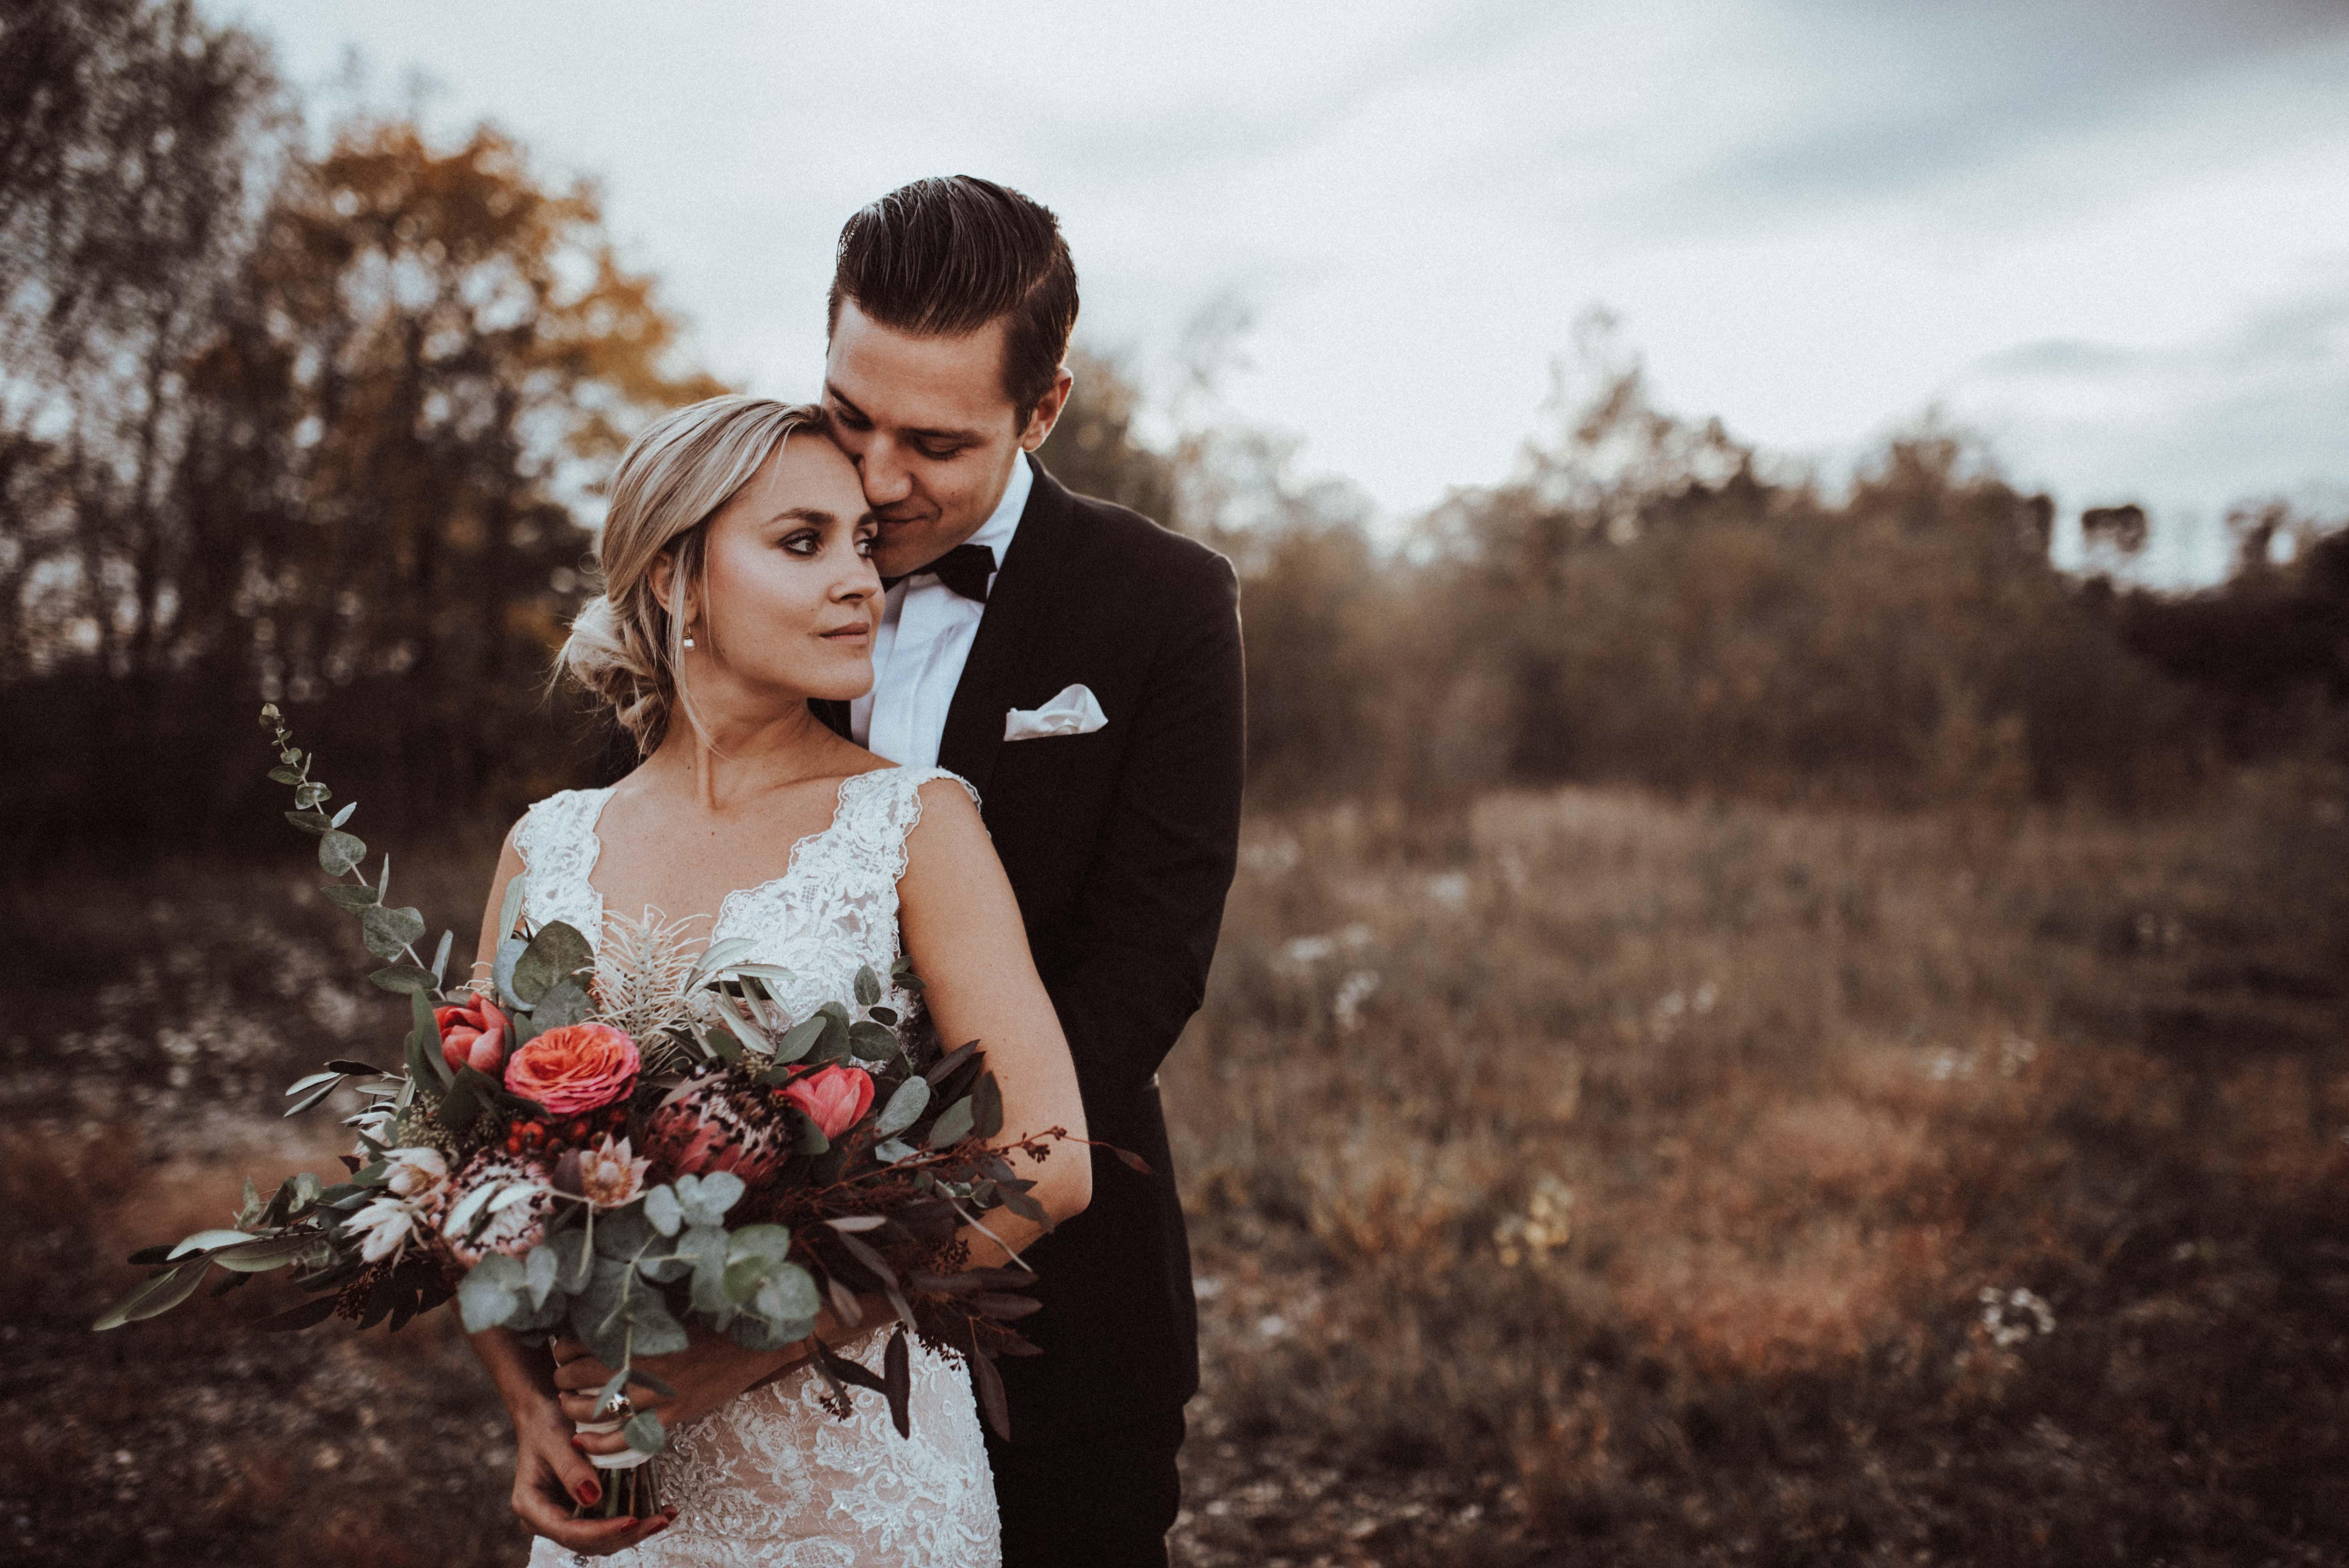 Hochzeitsfotografie Sonja Pöhlmann Photography Couples München Bayern